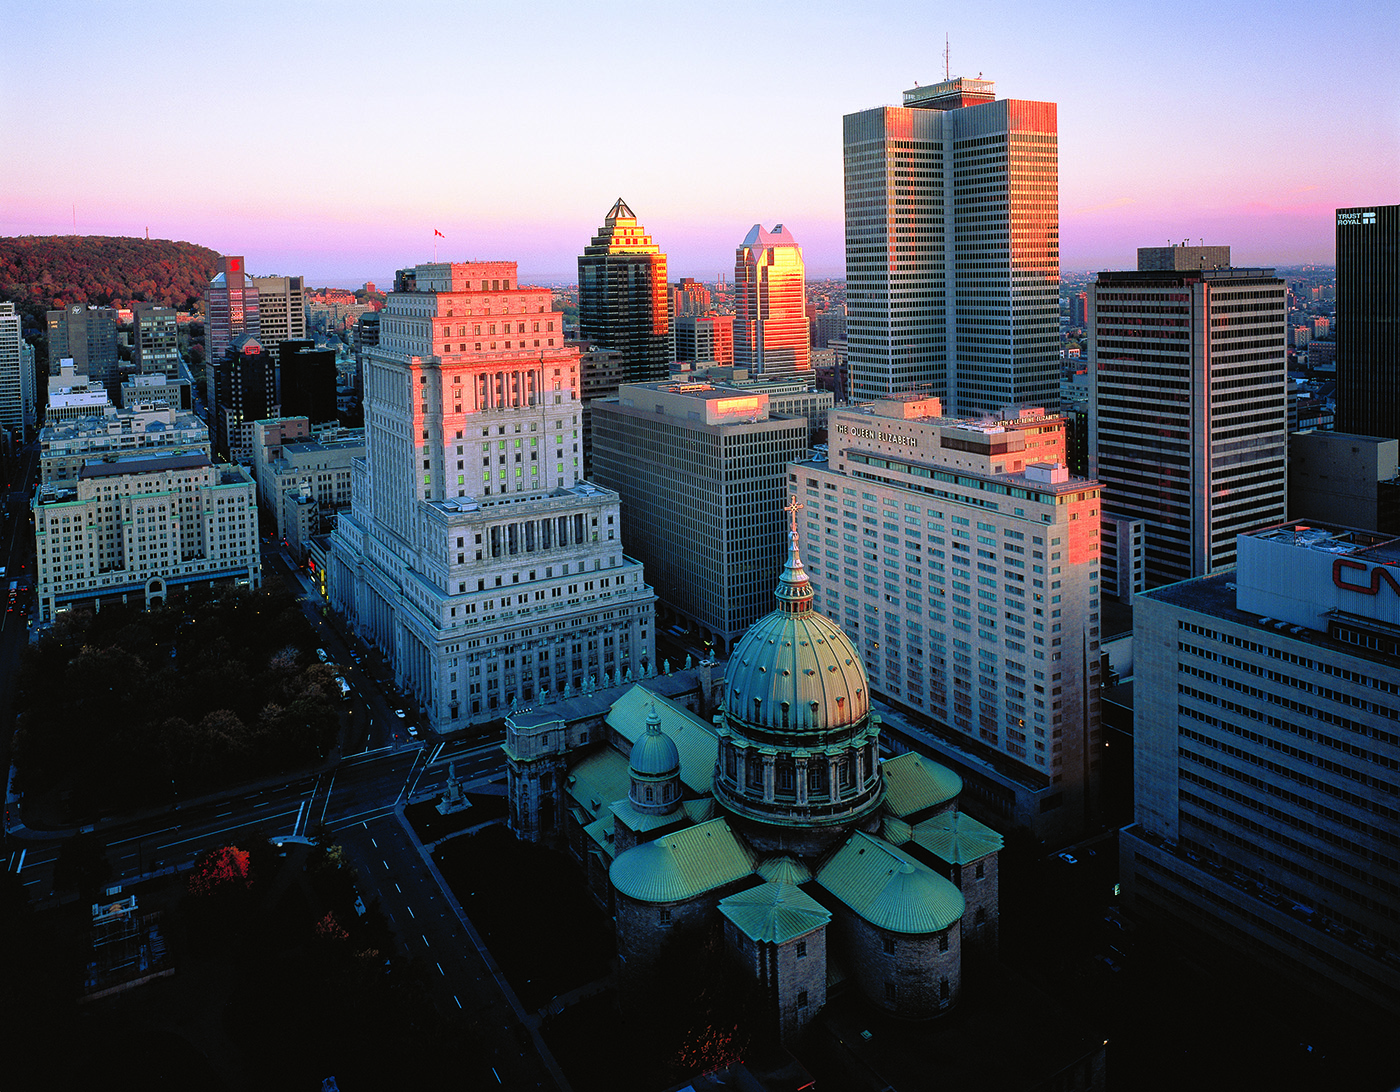 Fairmont Montreal